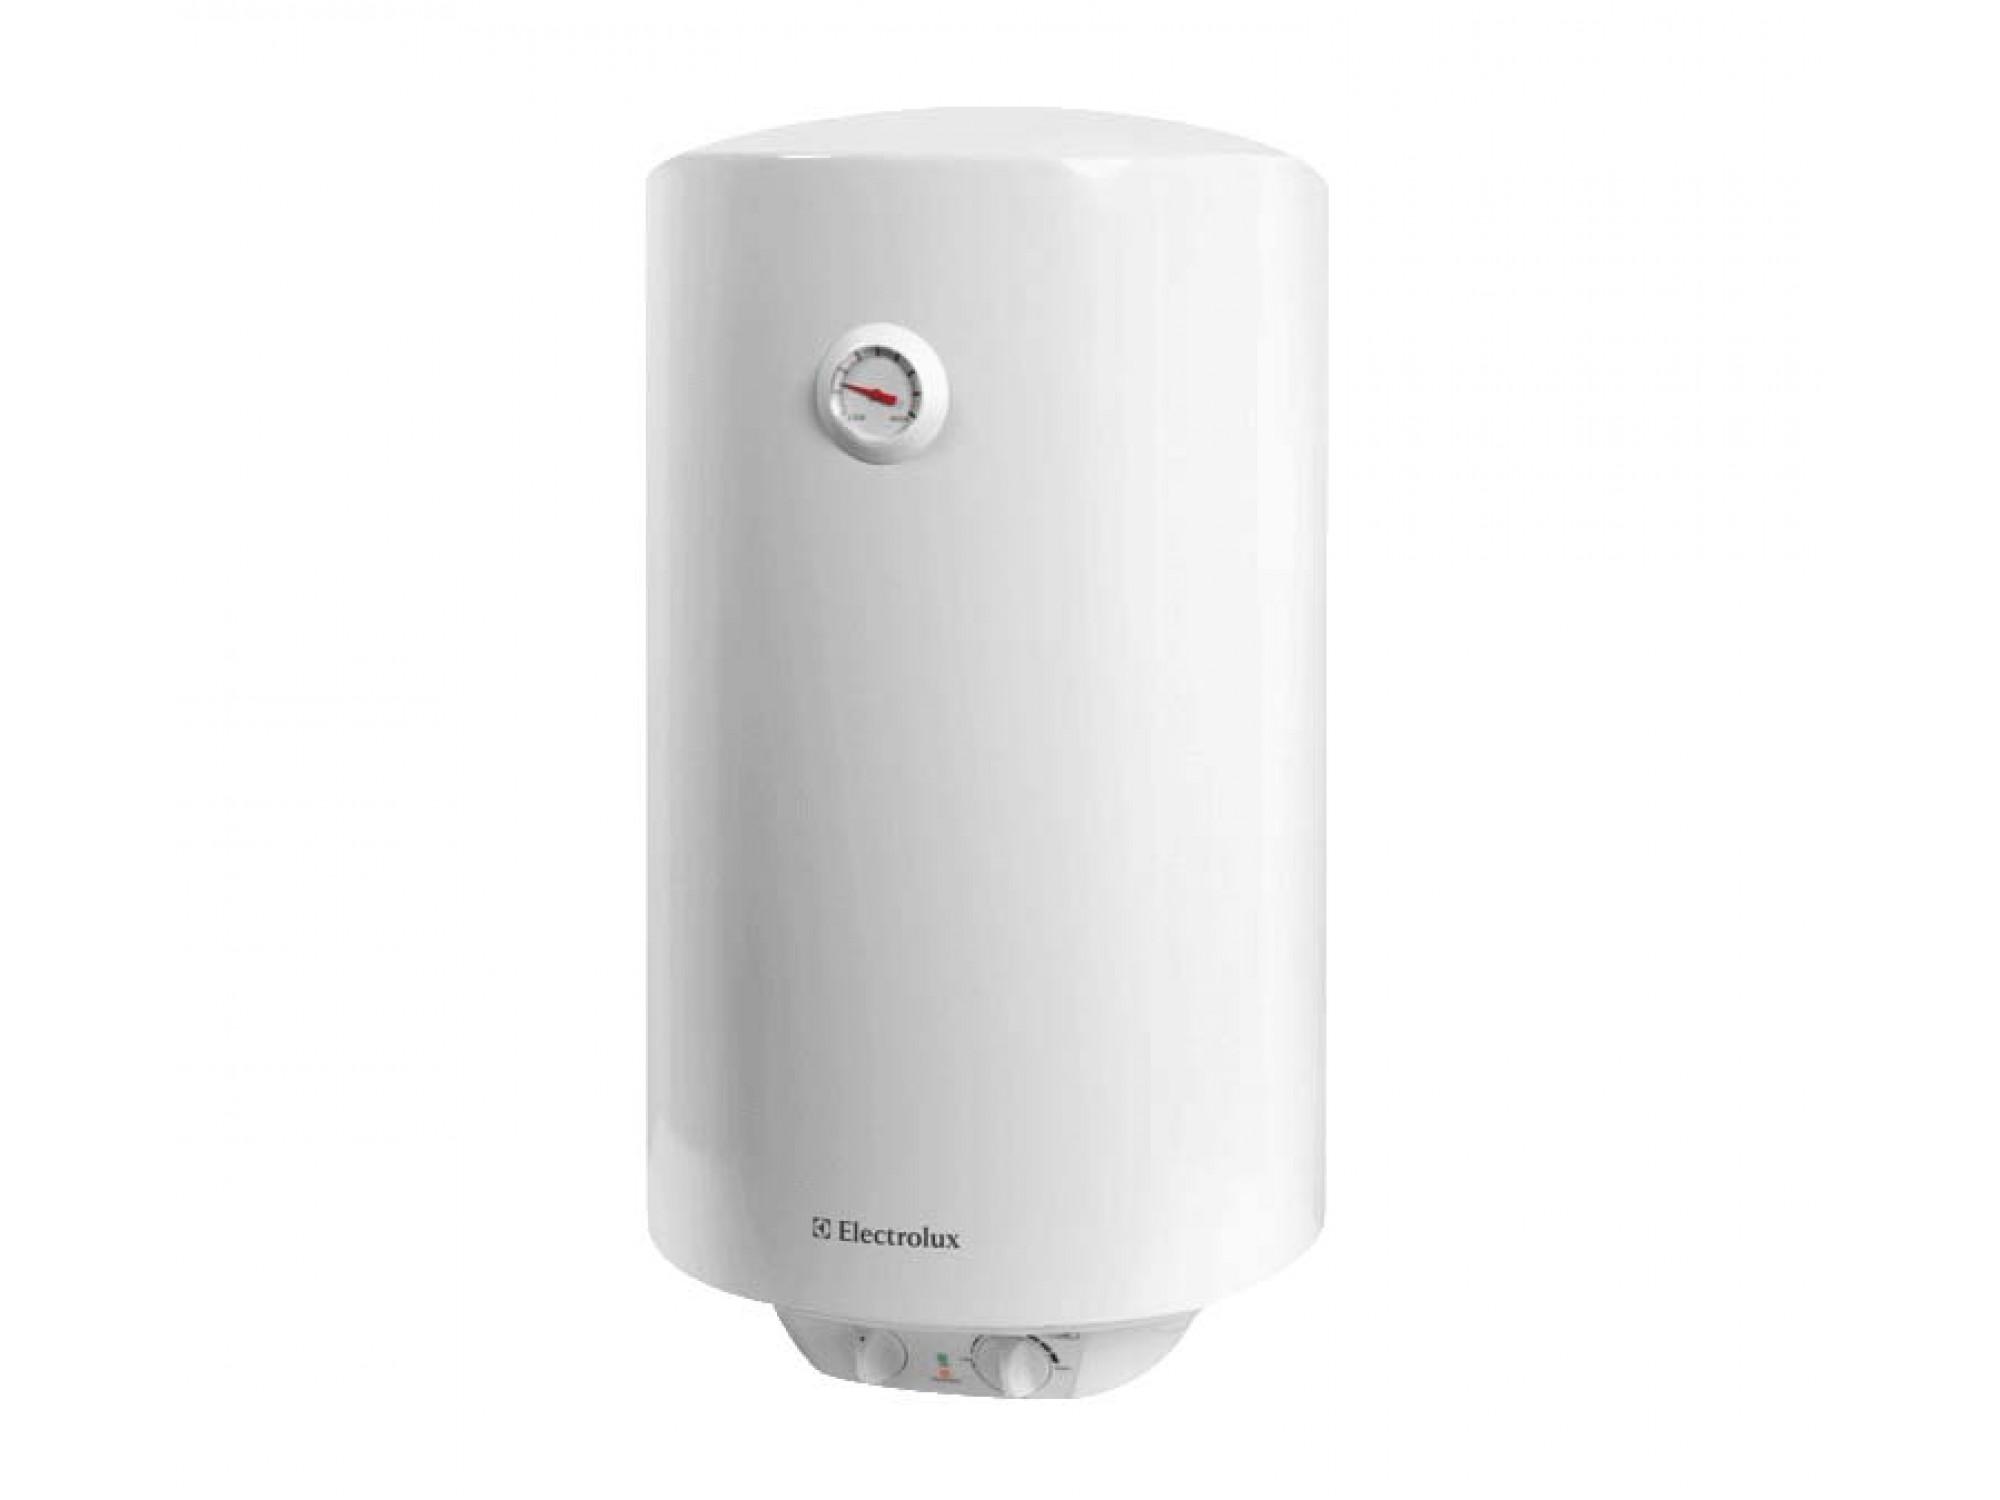 էլեկտրական ջրատաքացուցիչ ELECTROLUX EWH 80 QUANTUM PRO